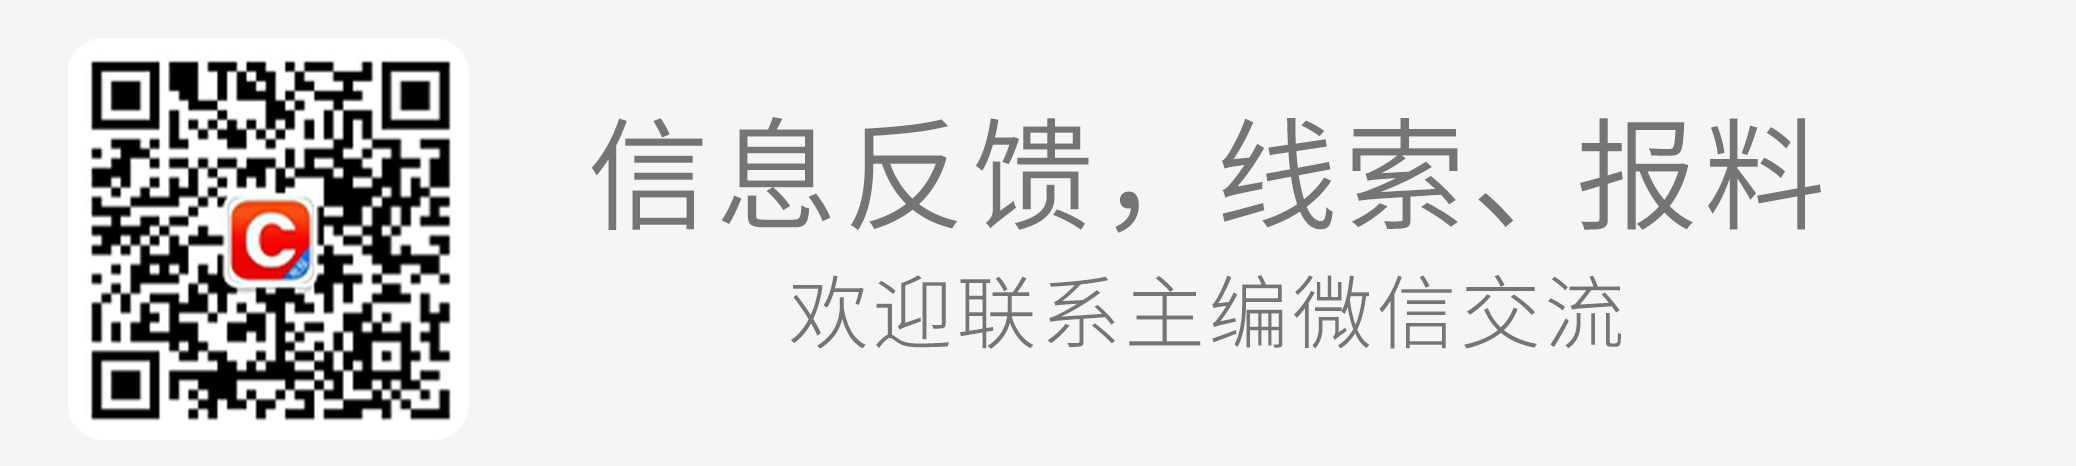 "A股""惊险""跳水!分析认为中国经济复苏为资产带来吸引力 市场中线向上趋势未变"